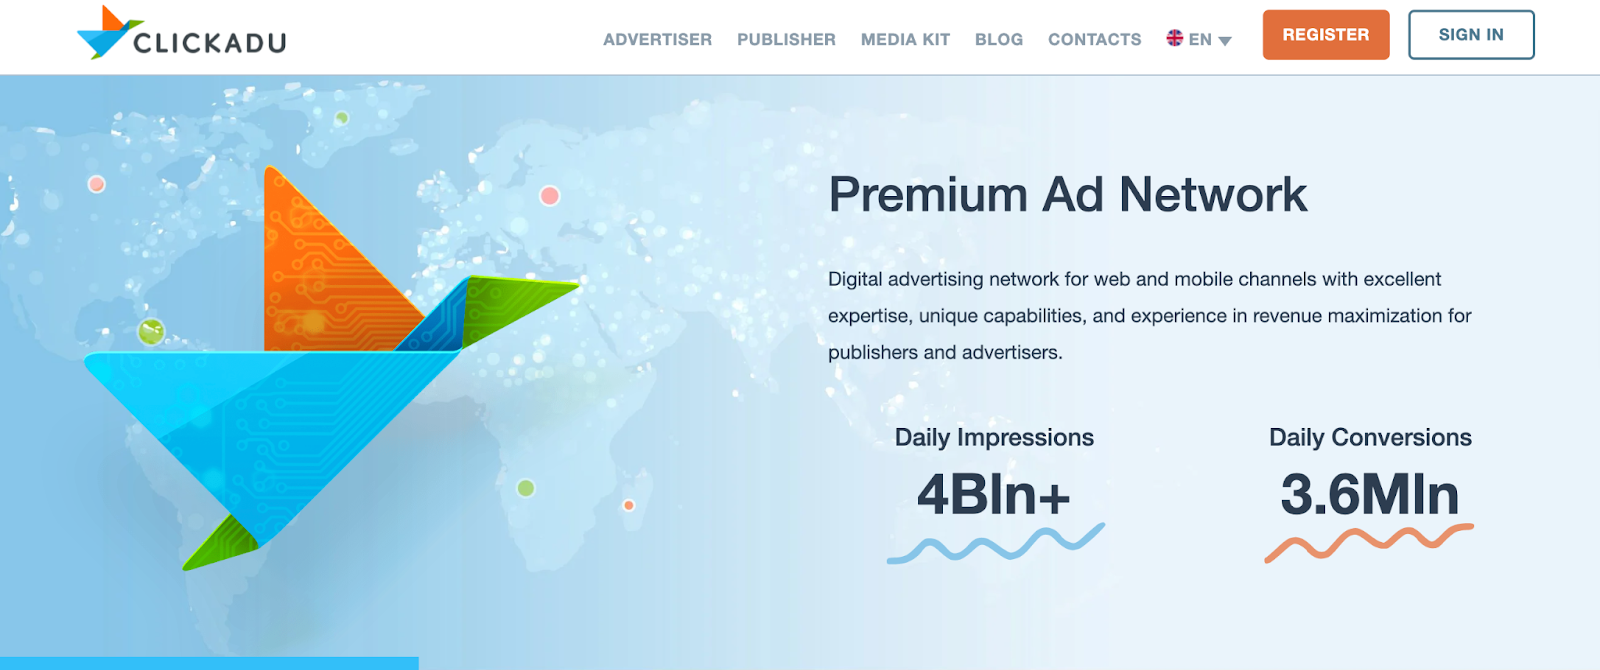 ClickAdu Homepage